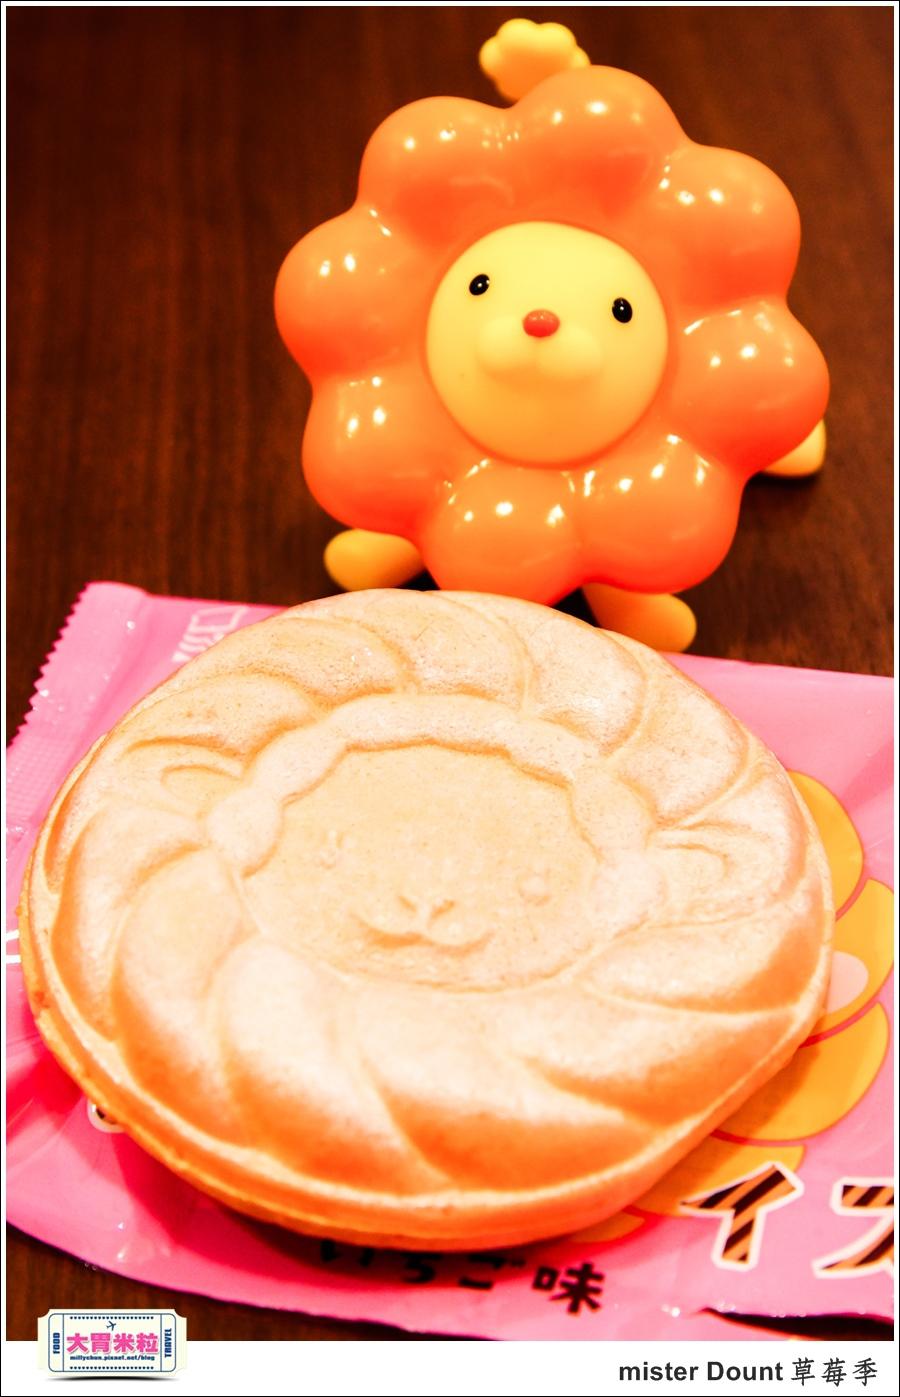 mister Dounth草莓季甜甜圈推薦@大胃米粒0018.jpg